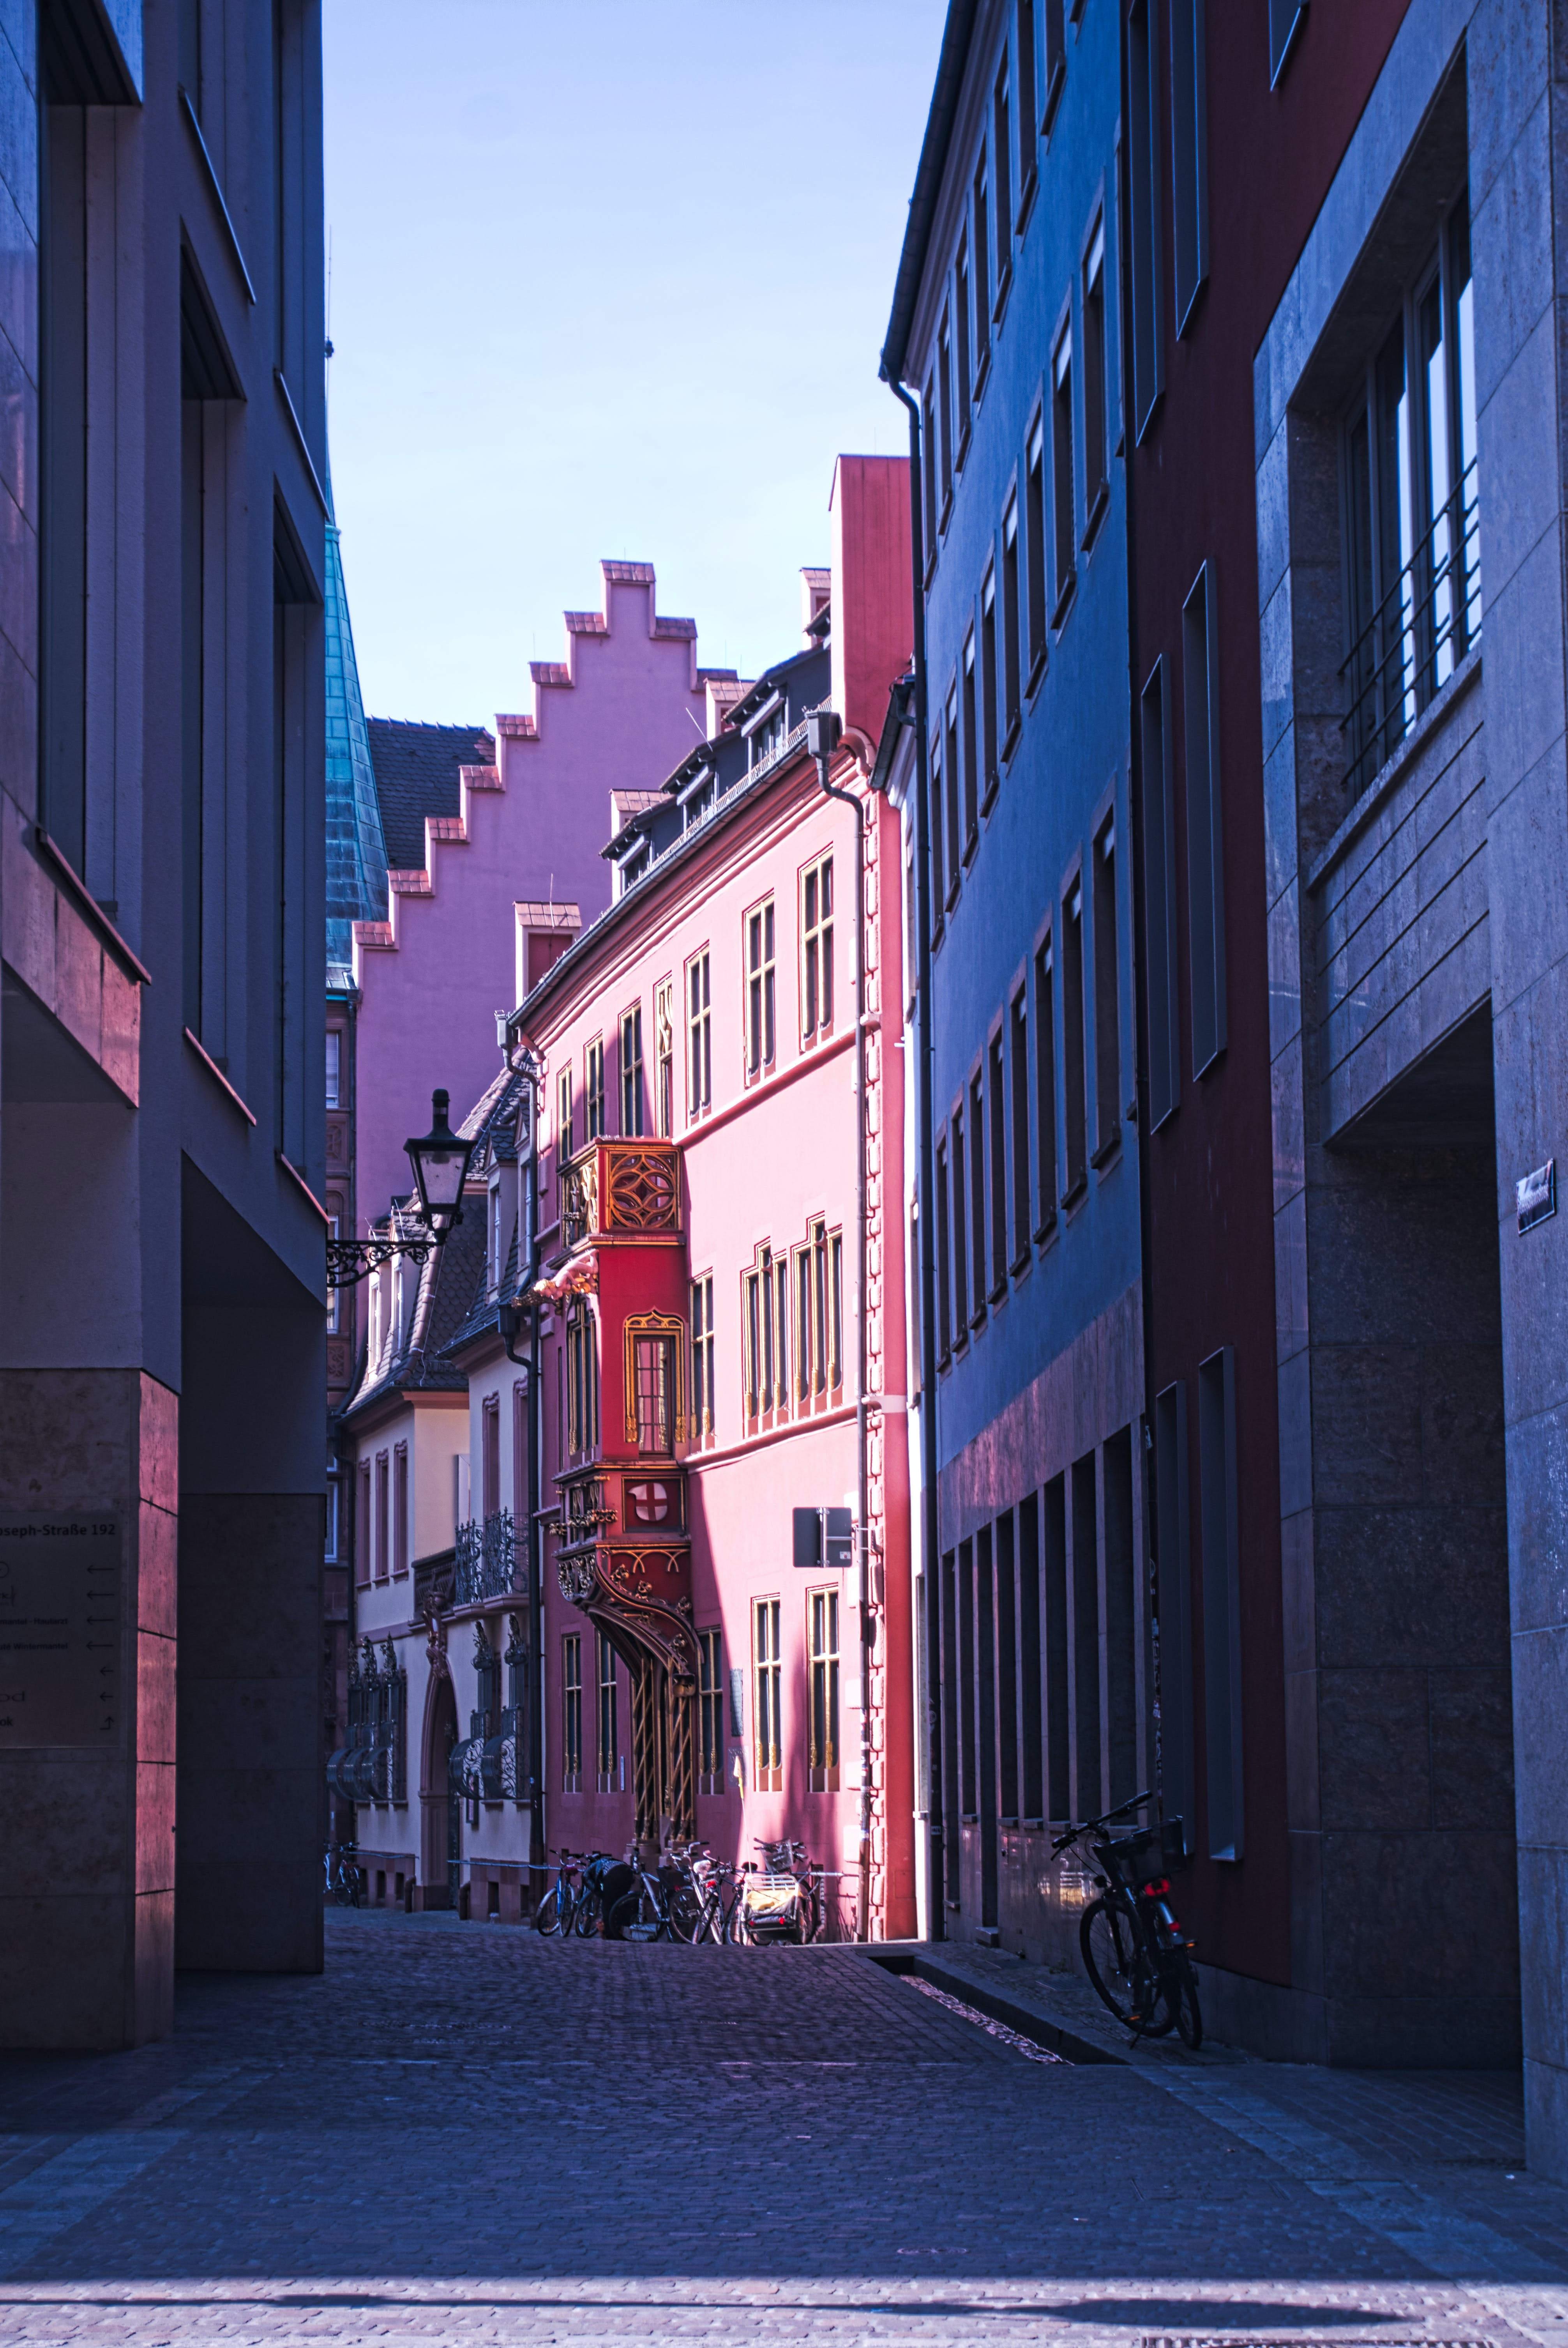 Free stock photo of Freiburg, Gässle